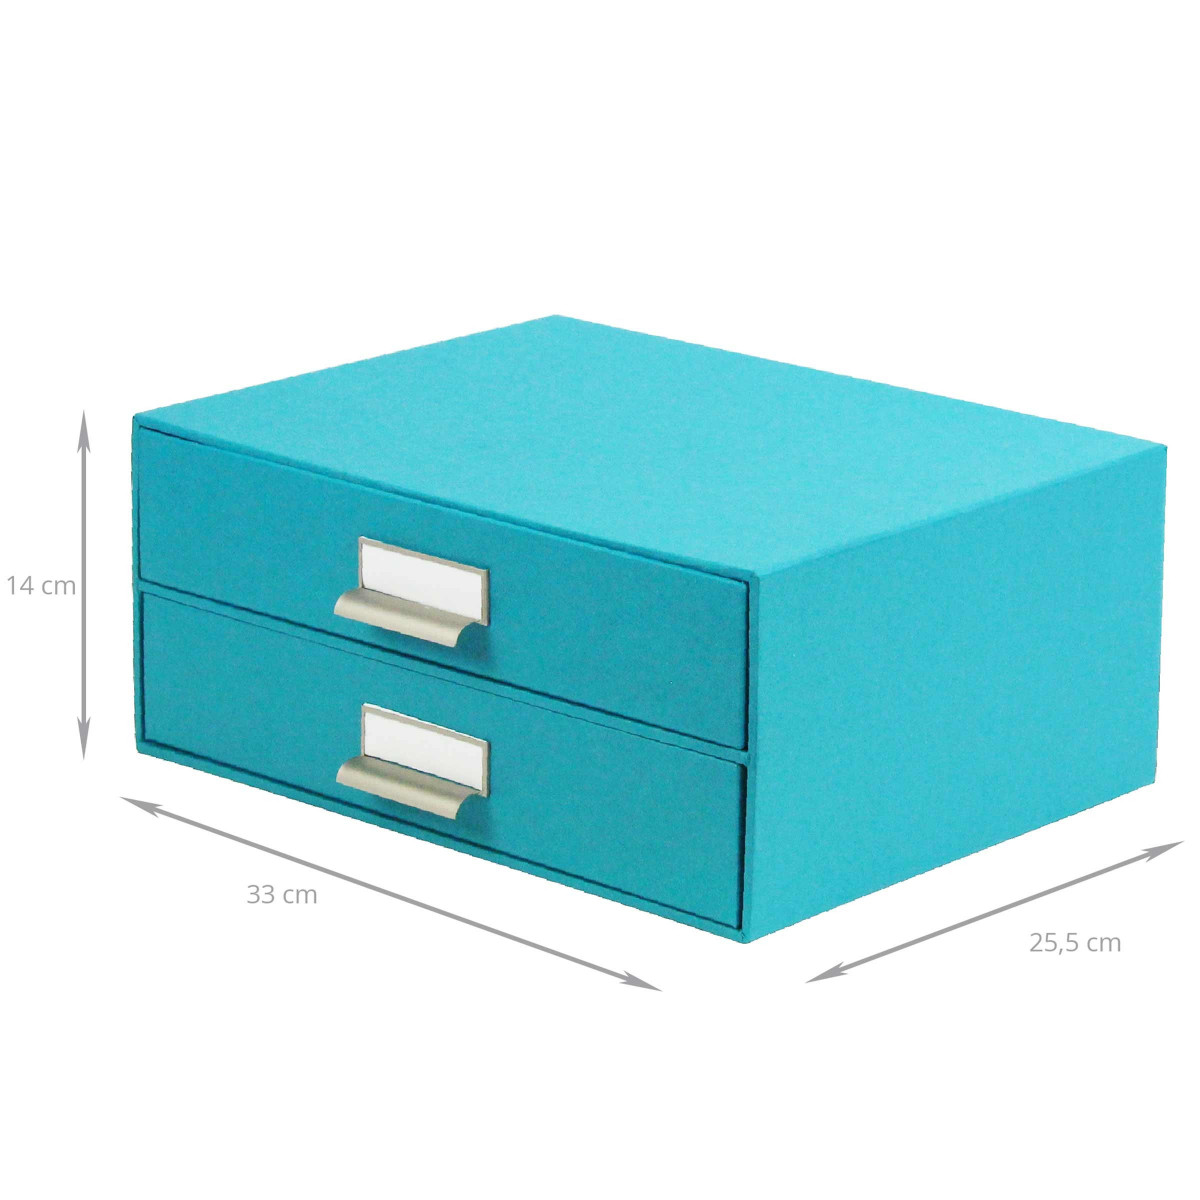 bo te carton turquoise 2 tiroirs archivage. Black Bedroom Furniture Sets. Home Design Ideas